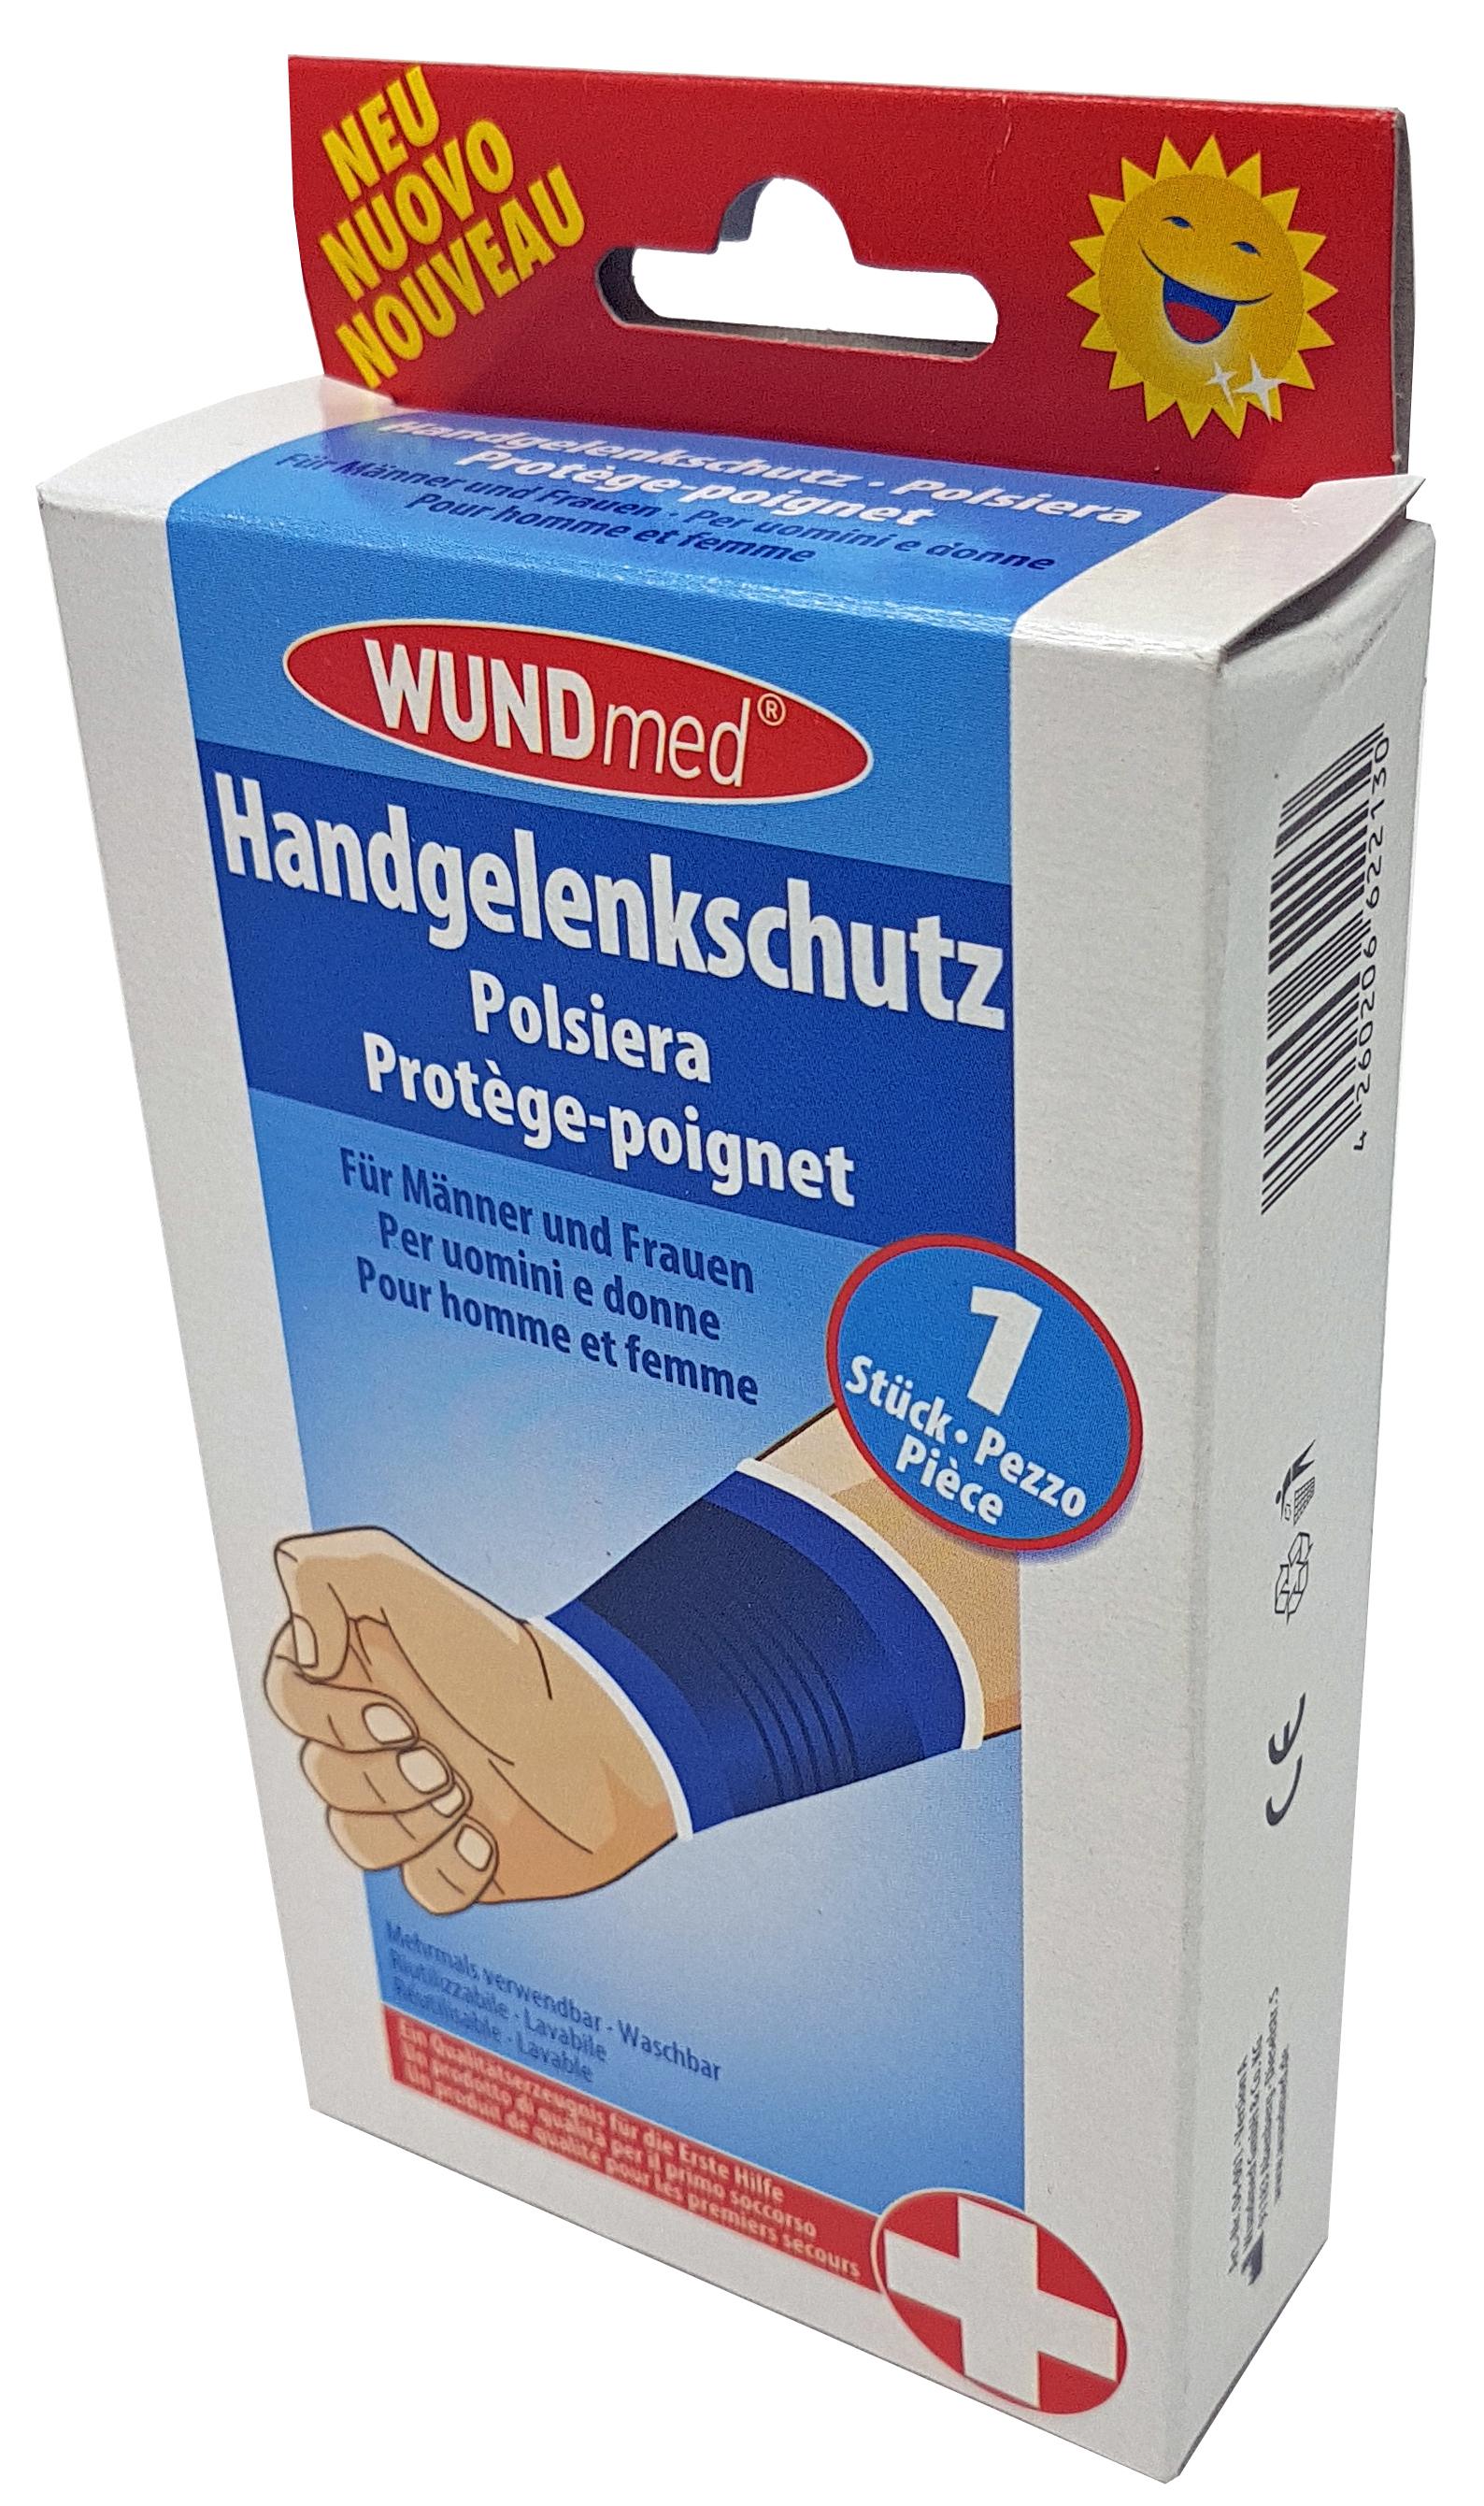 01766 - Wundmed Handgelenkschutz, Unisex